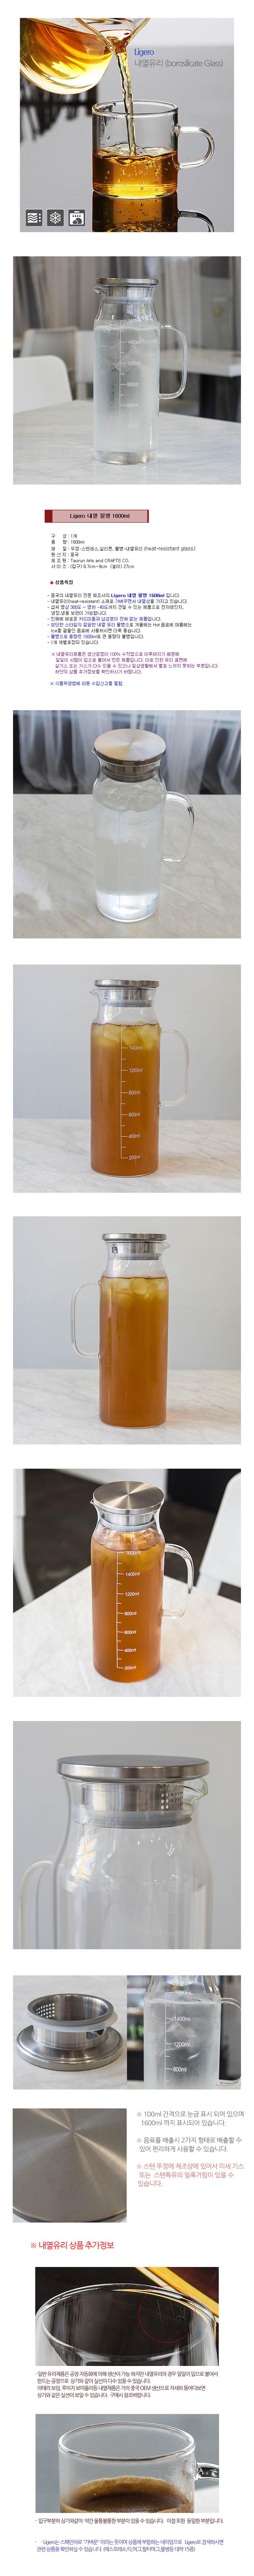 Ligero 내열 물병 1600ml 1P - 더리빙샵, 20,400원, 보틀/텀블러, 키친 물병